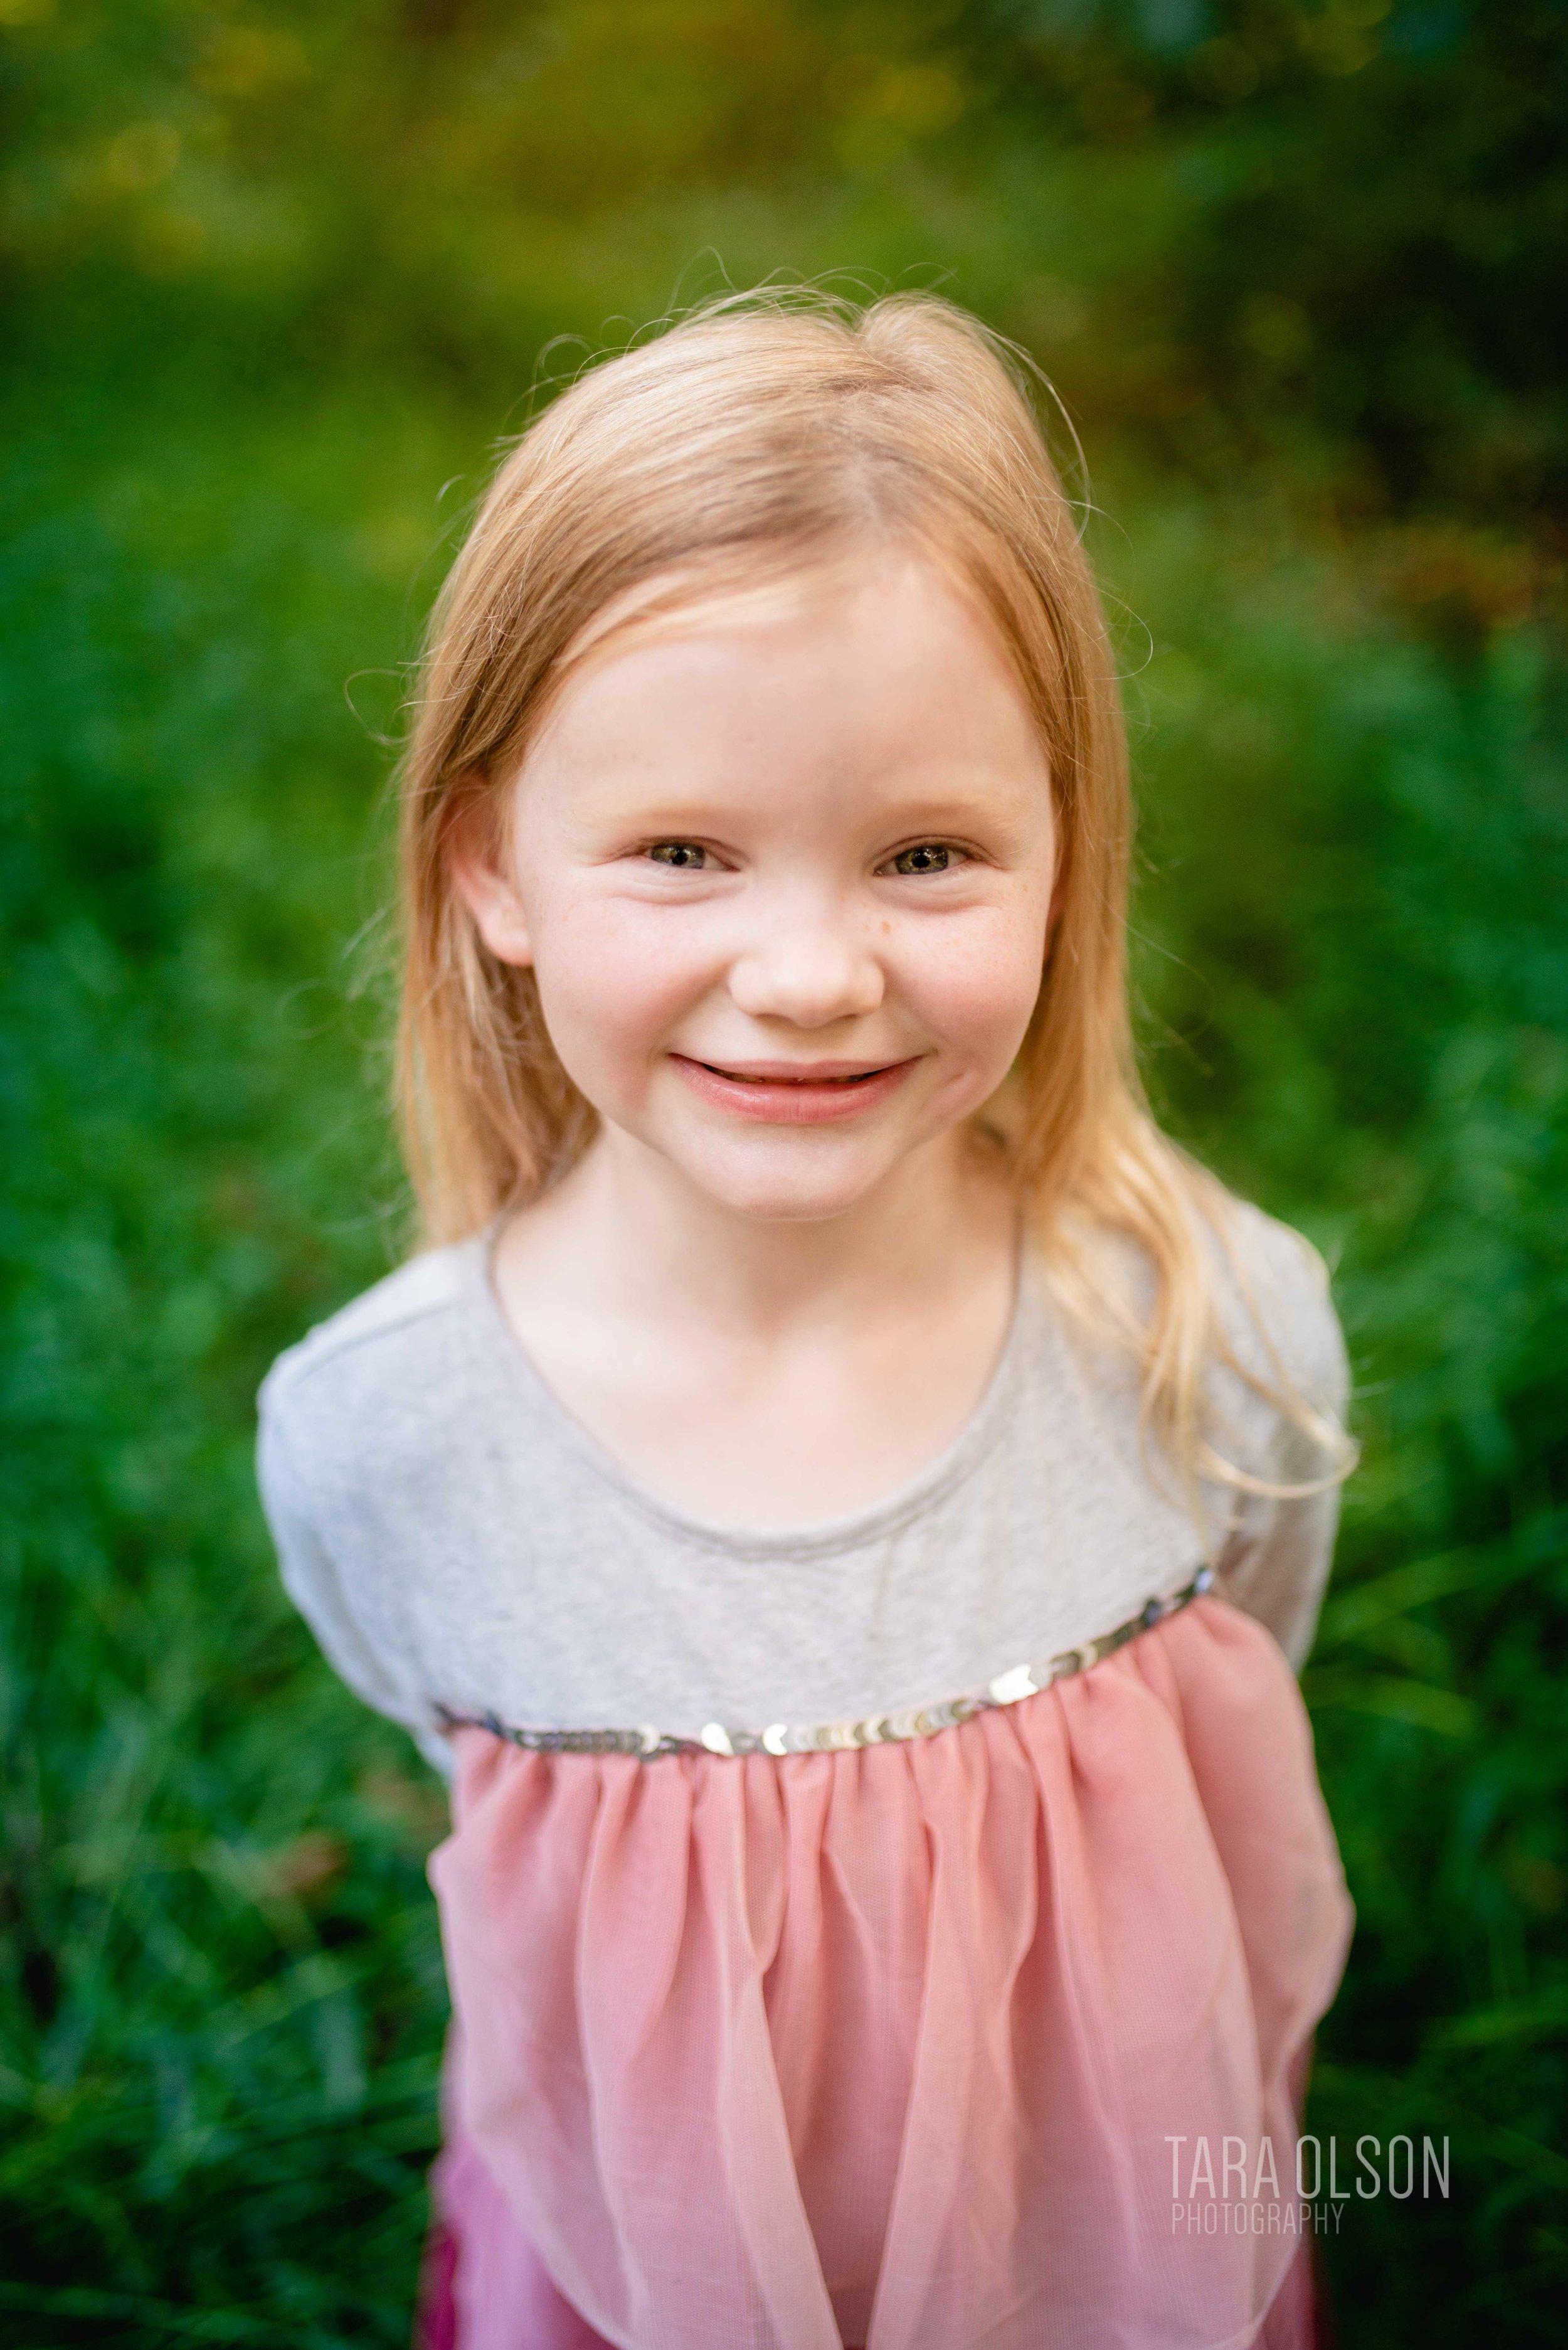 Hawkins_Arlington-Virginia-Family-Photographer_Tara-Olson-Photography_4239.jpg